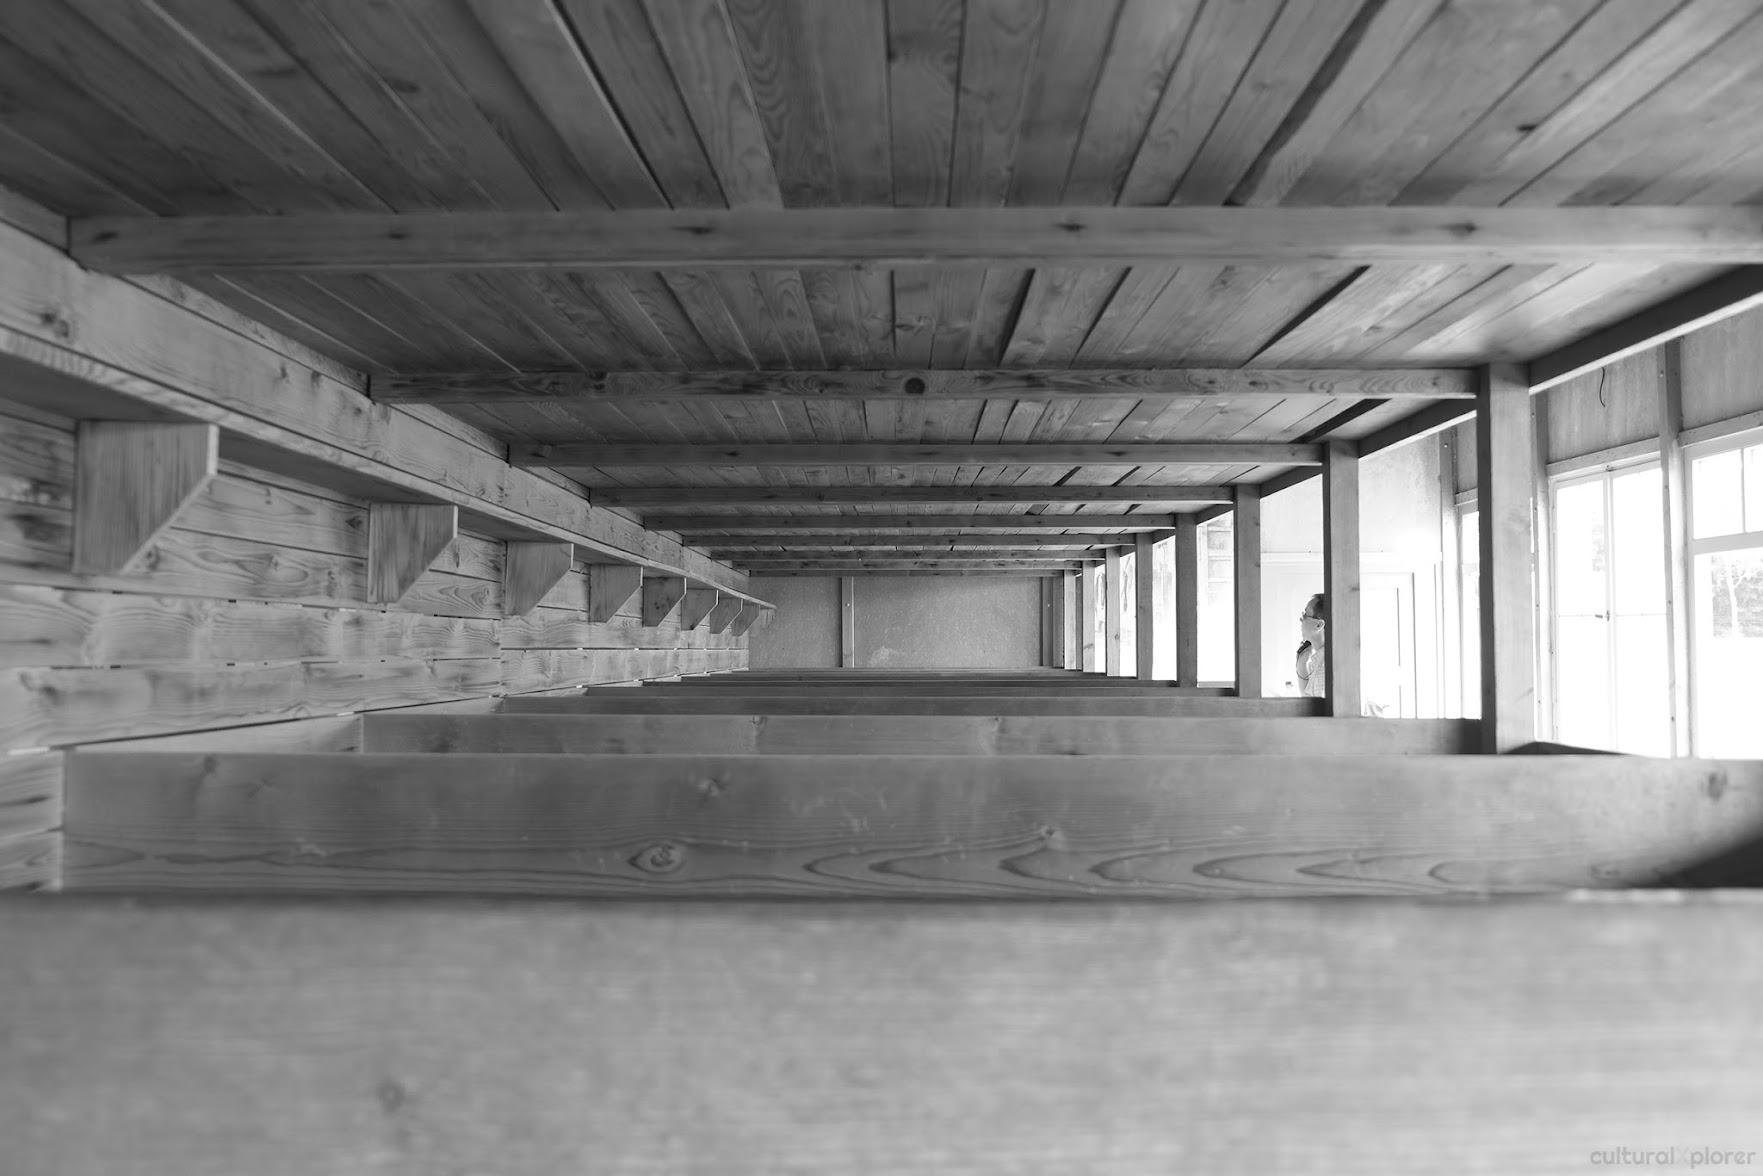 Dachau barracks bunk beds